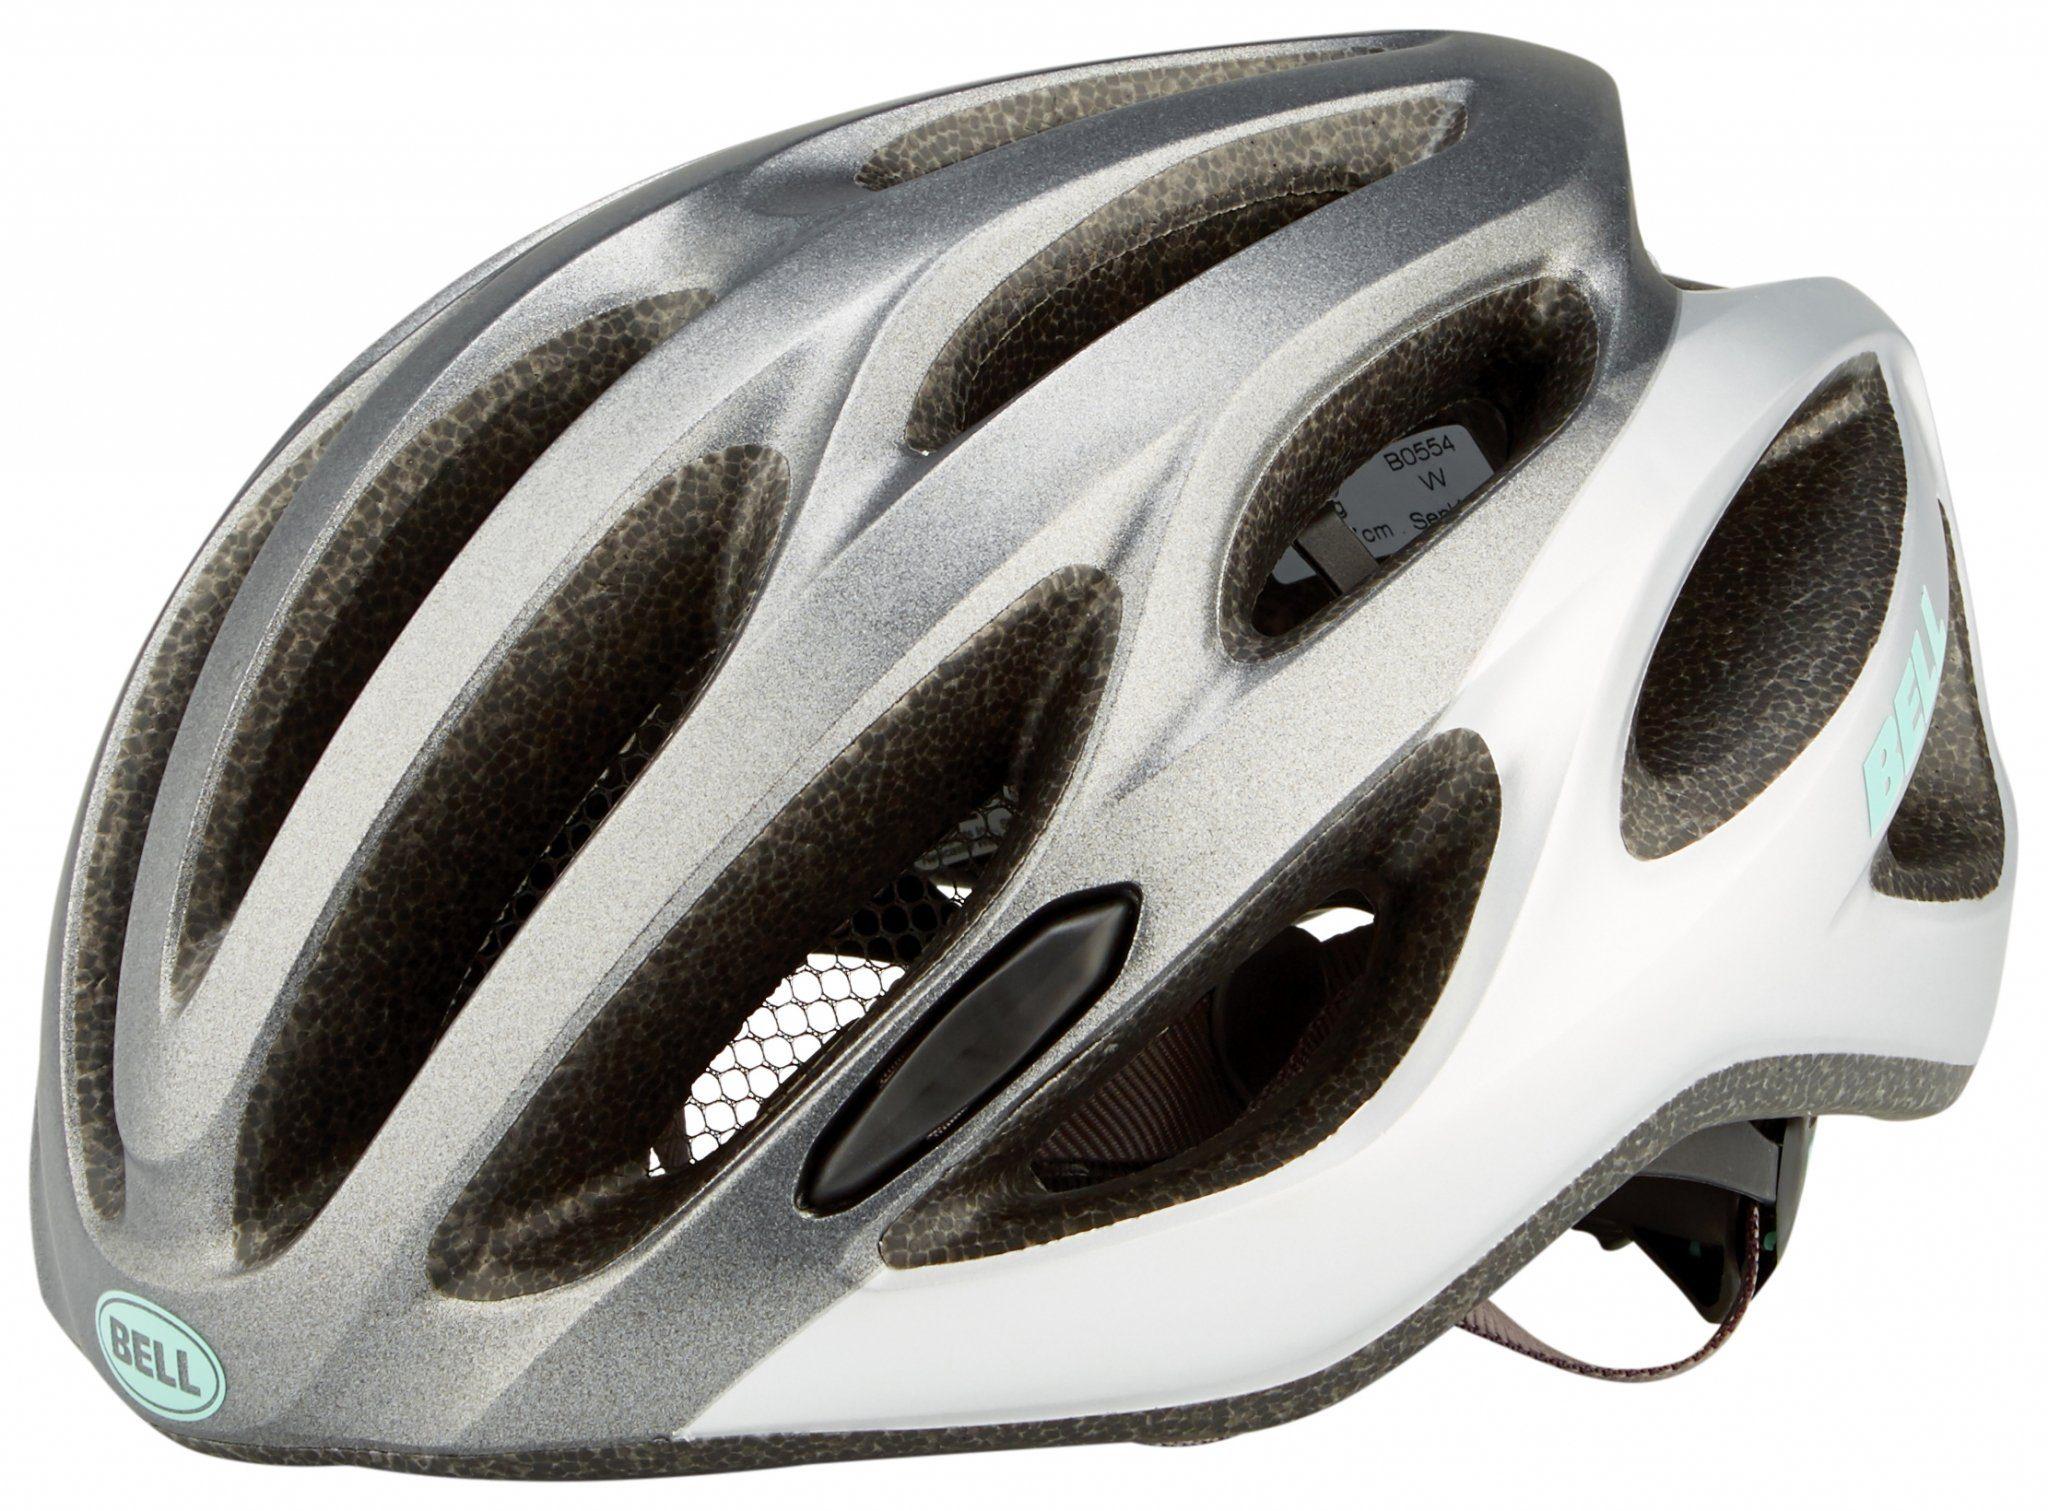 Bell Fahrradhelm »Tempo Helmet Unisize Women«